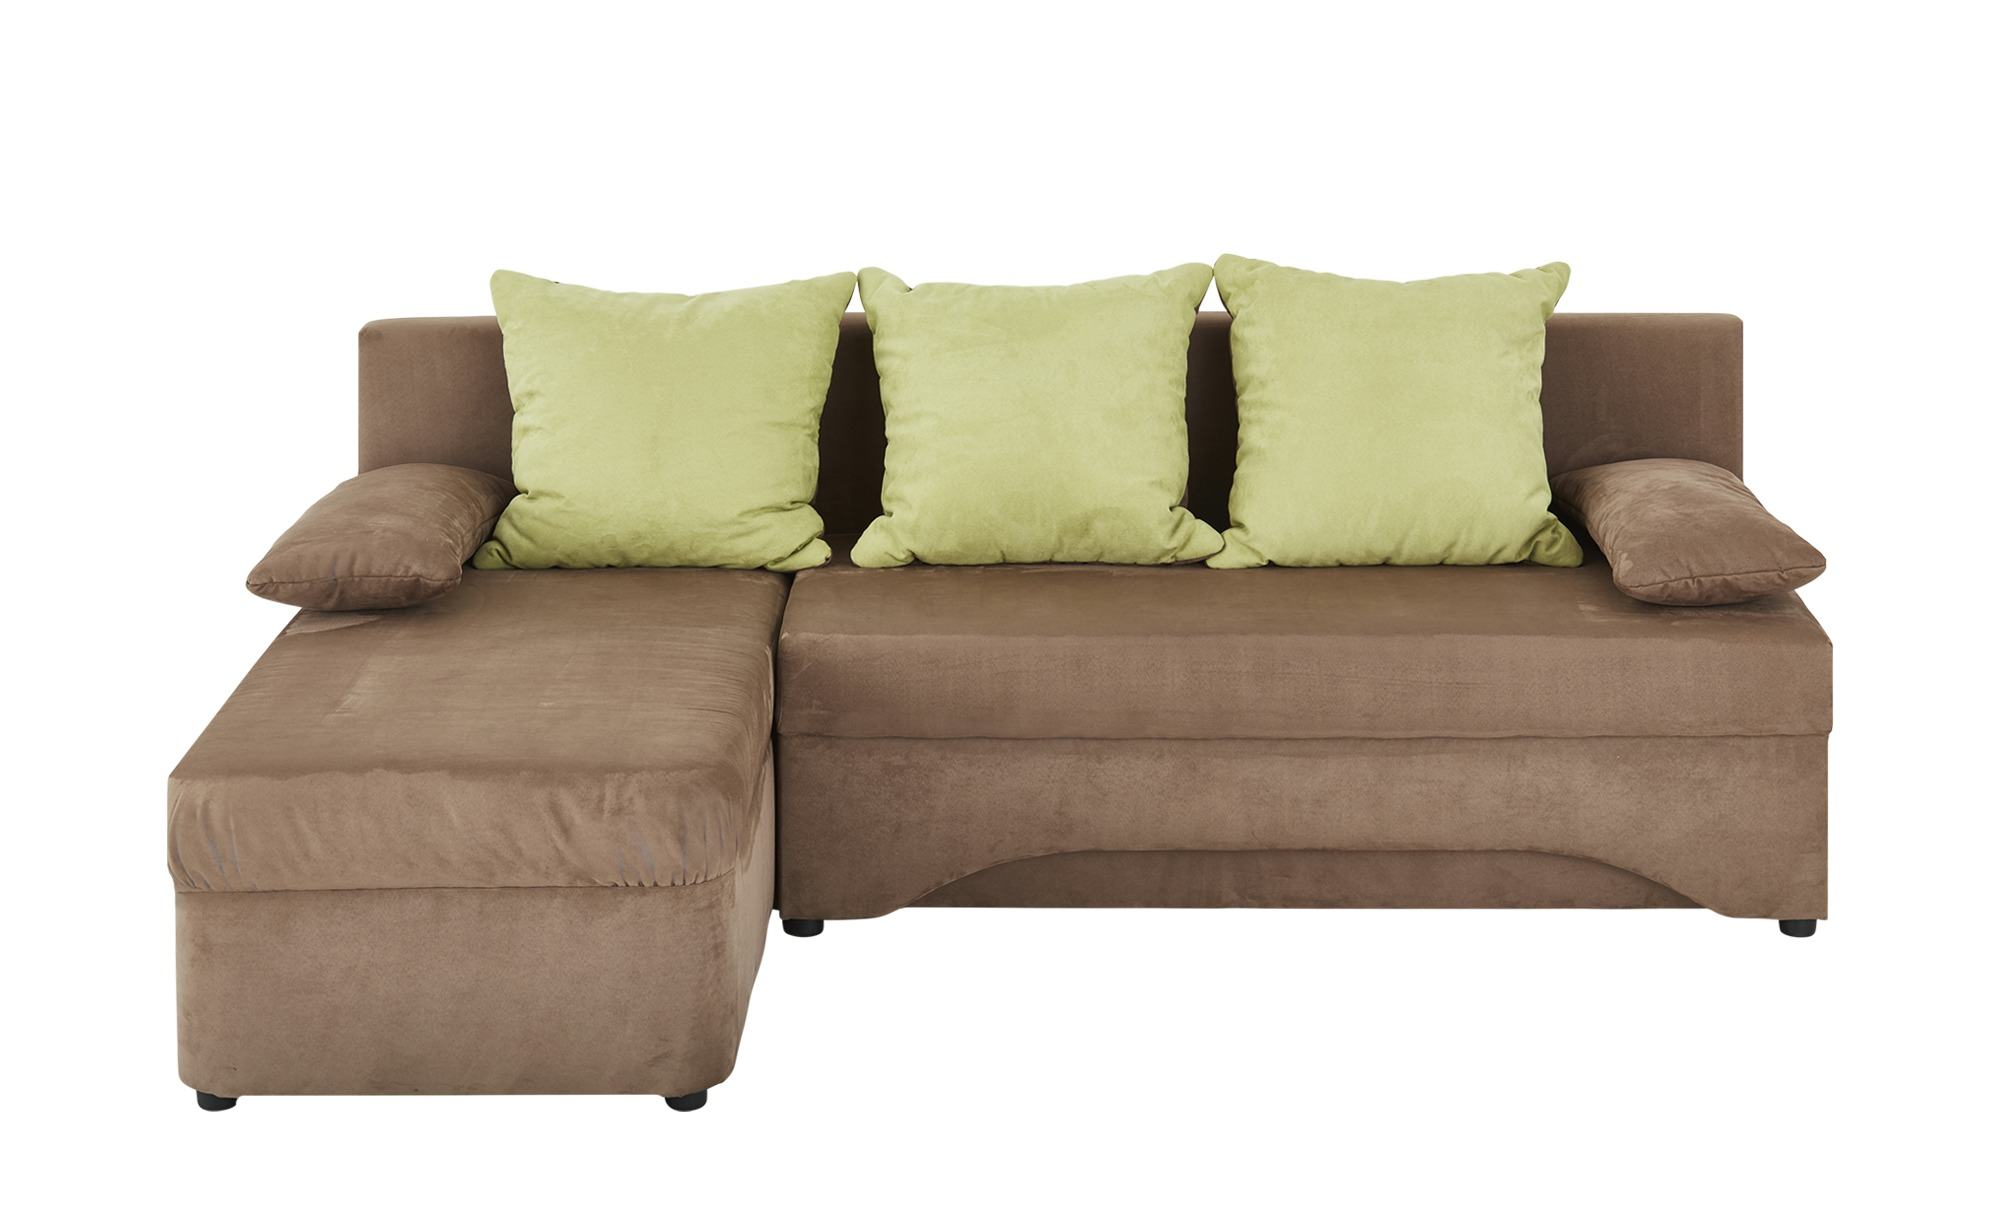 Contemporary Sofa Covers Grosses Sofa Kaufen Sofa Online Shopping In Coimbatore Big Sofa Xxl Couch L Form Afrika L Ecksofa Big Sofa Kaufen Ecksofa Braun